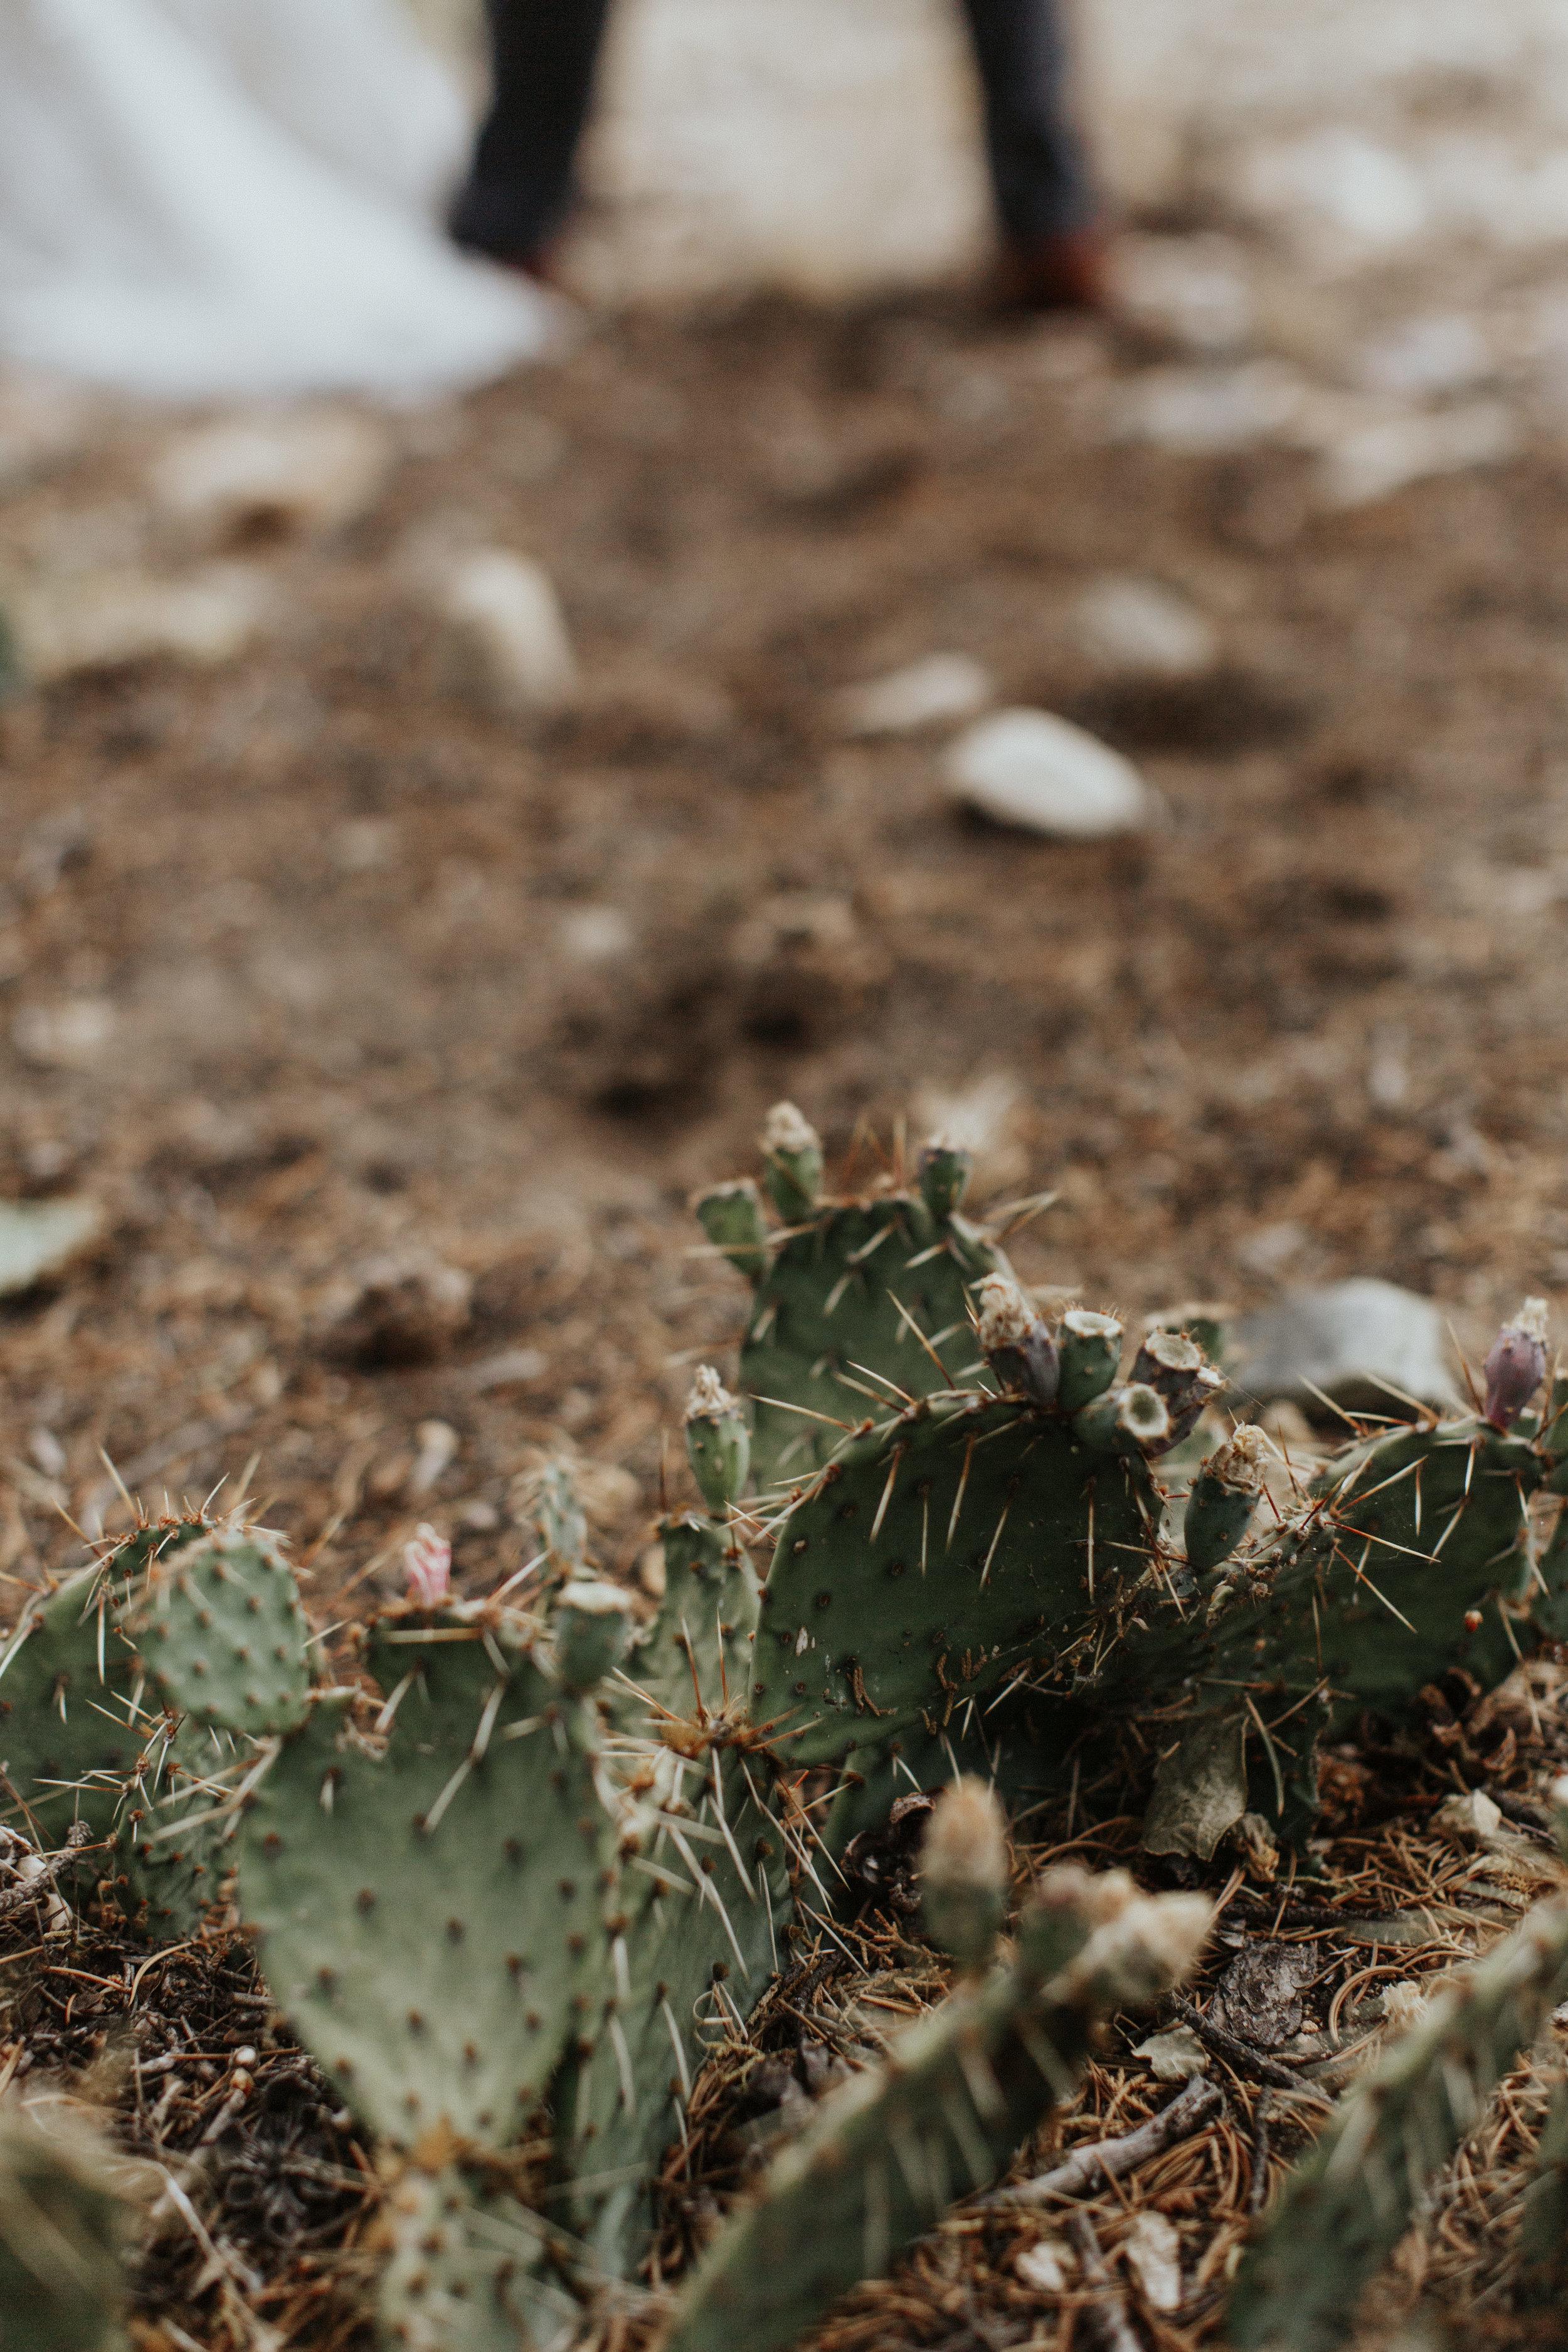 Redden, Redden Photography, Denver Wedding Photographer, Colorado Wedding Photographer, Taos Wedding Photographer, New Mexico Wedding Photographer, Fine Art Wedding Photographer, High End Wedding Photographer, Denver Photographer, New Mexico Wedding, Taos Wedding, Mountain Wedding Photographer, Adventure Wedding Photographer, Wedding Cactus